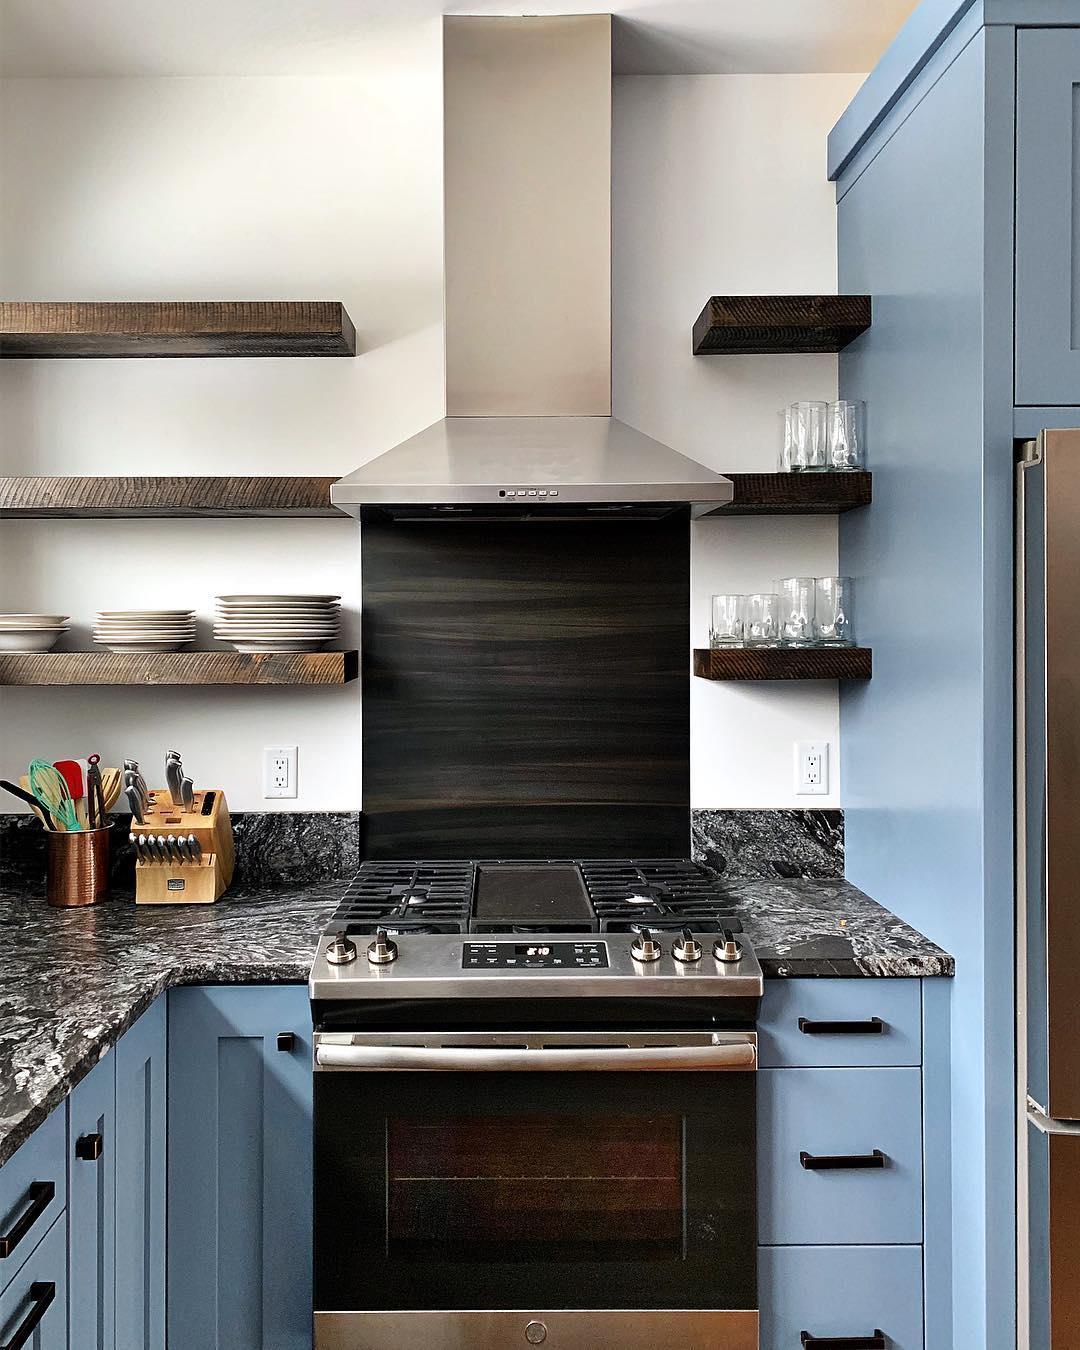 Cabin Kitchen ️ @cmtfabrication whitefish custom home builder